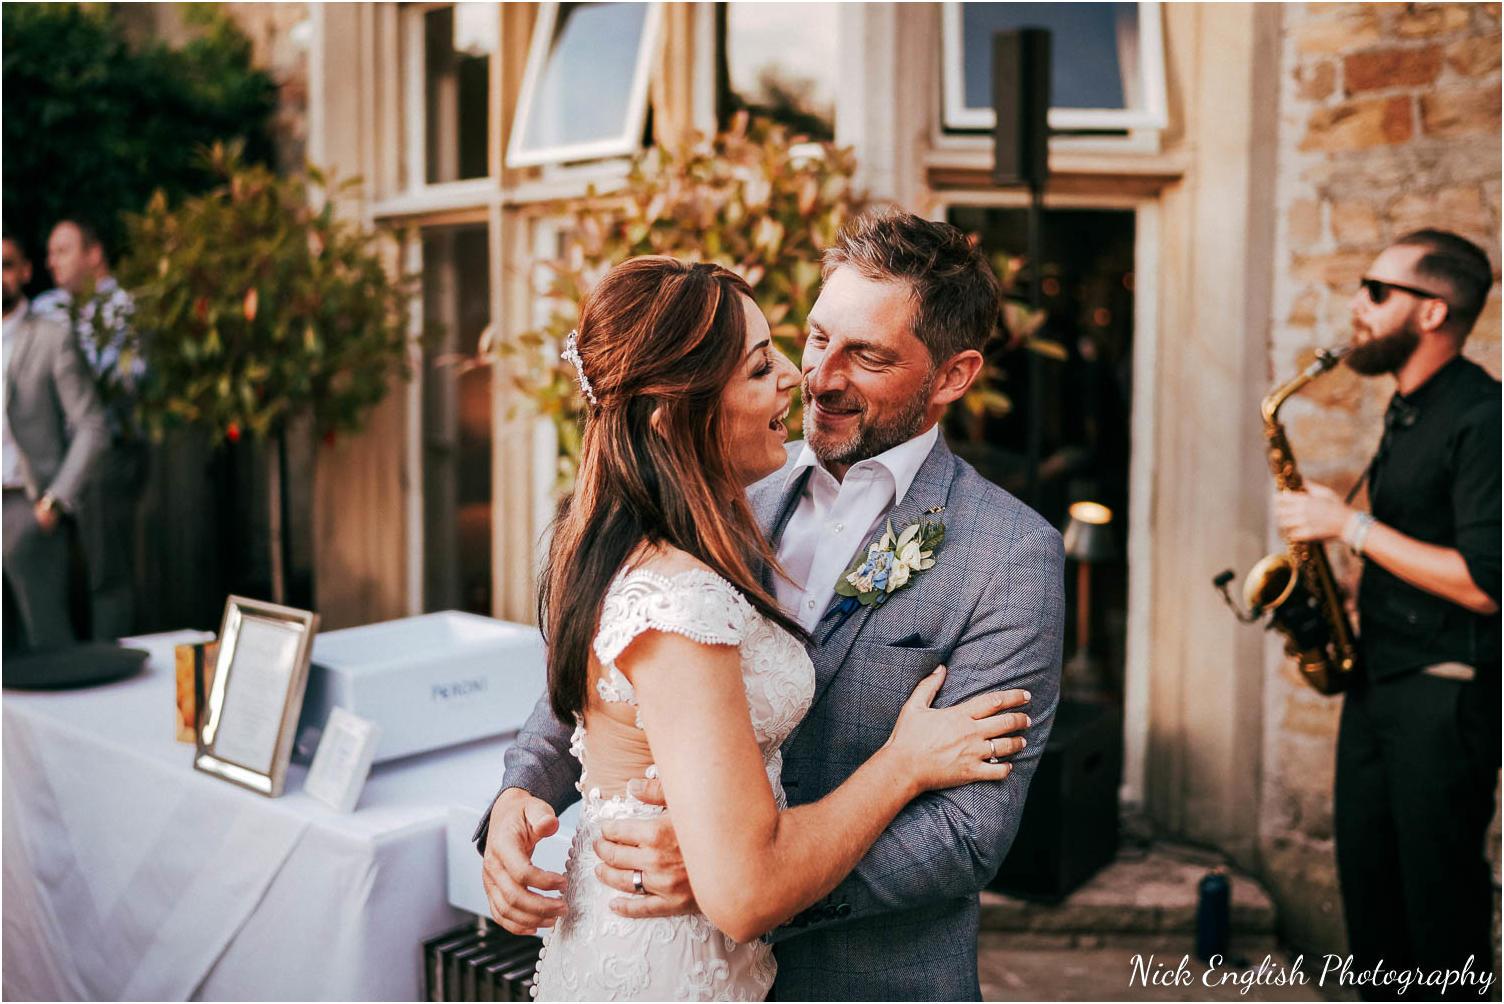 Mitton_Hall_Wedding_Photographer-116.jpg